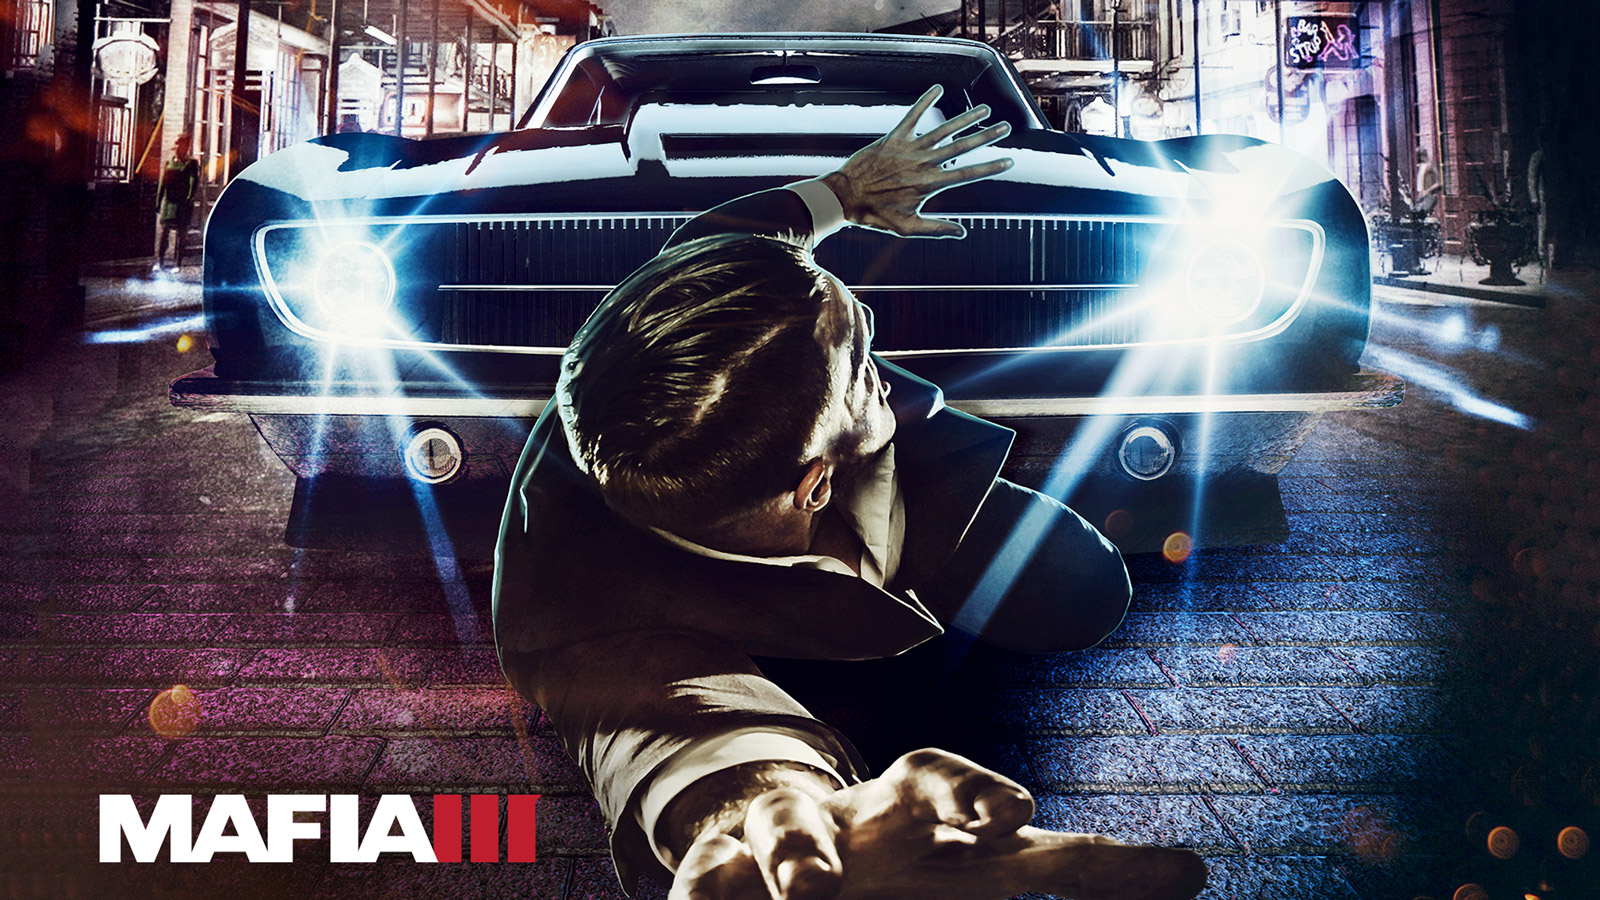 Free Mafia III Wallpaper in 1600x900